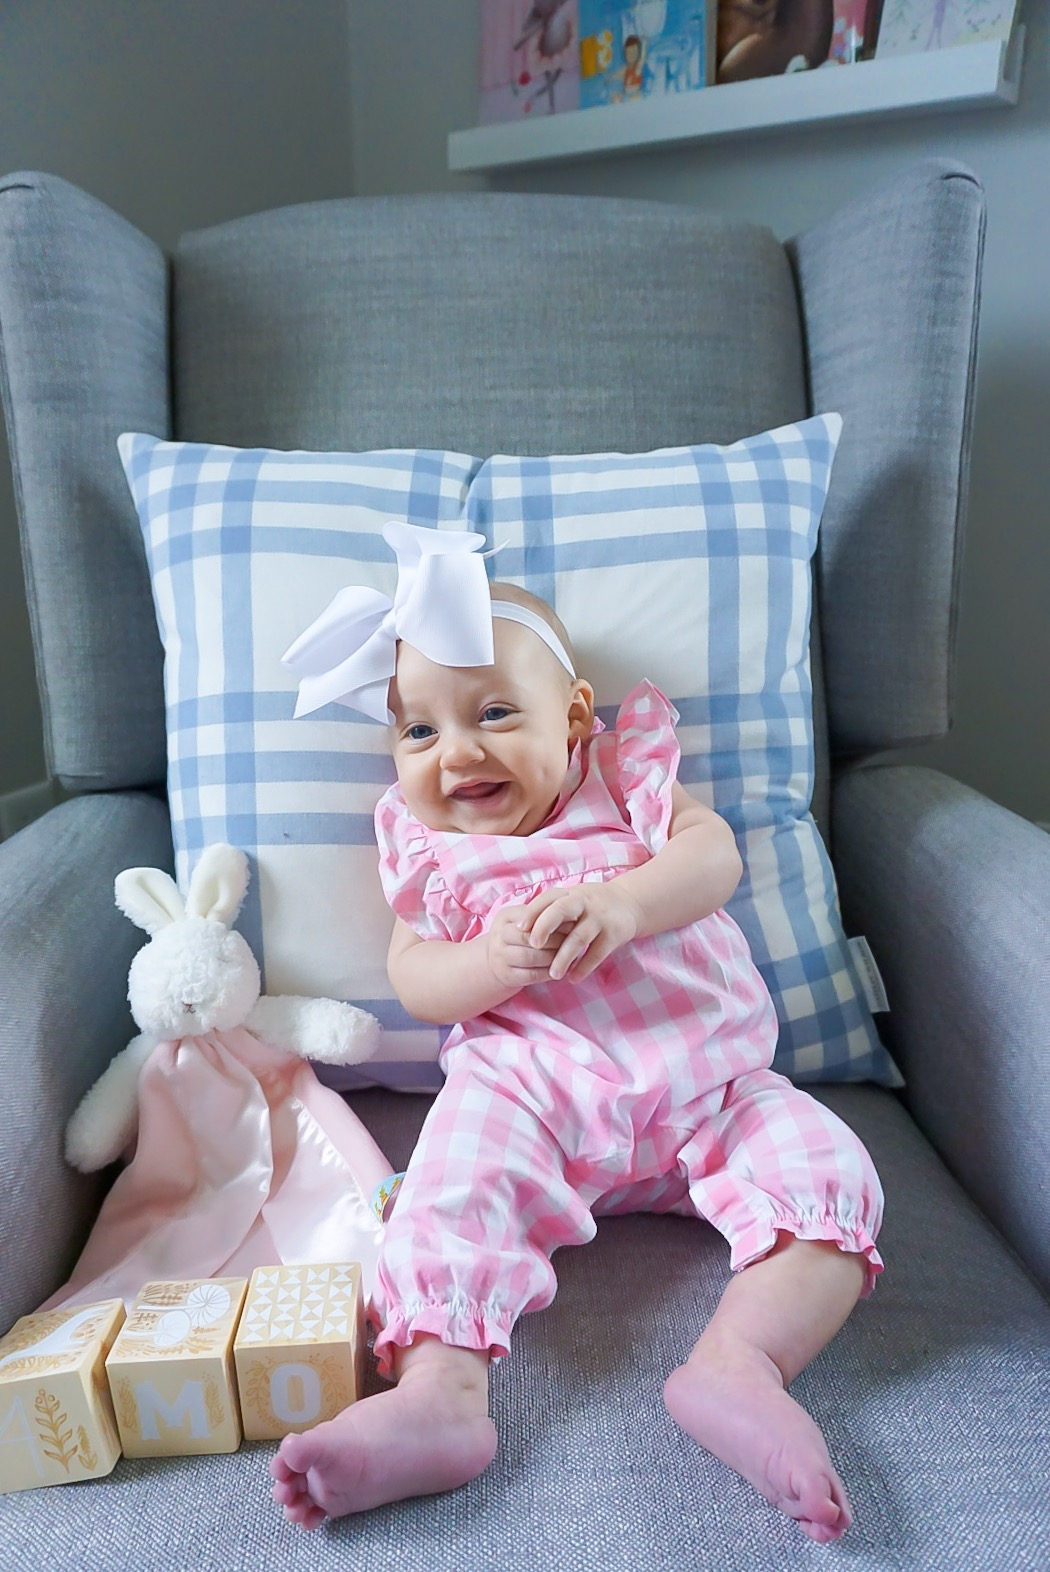 preppy baby girl clothing, motherhood blog, 4 month old baby blog, best 4 month old baby toys